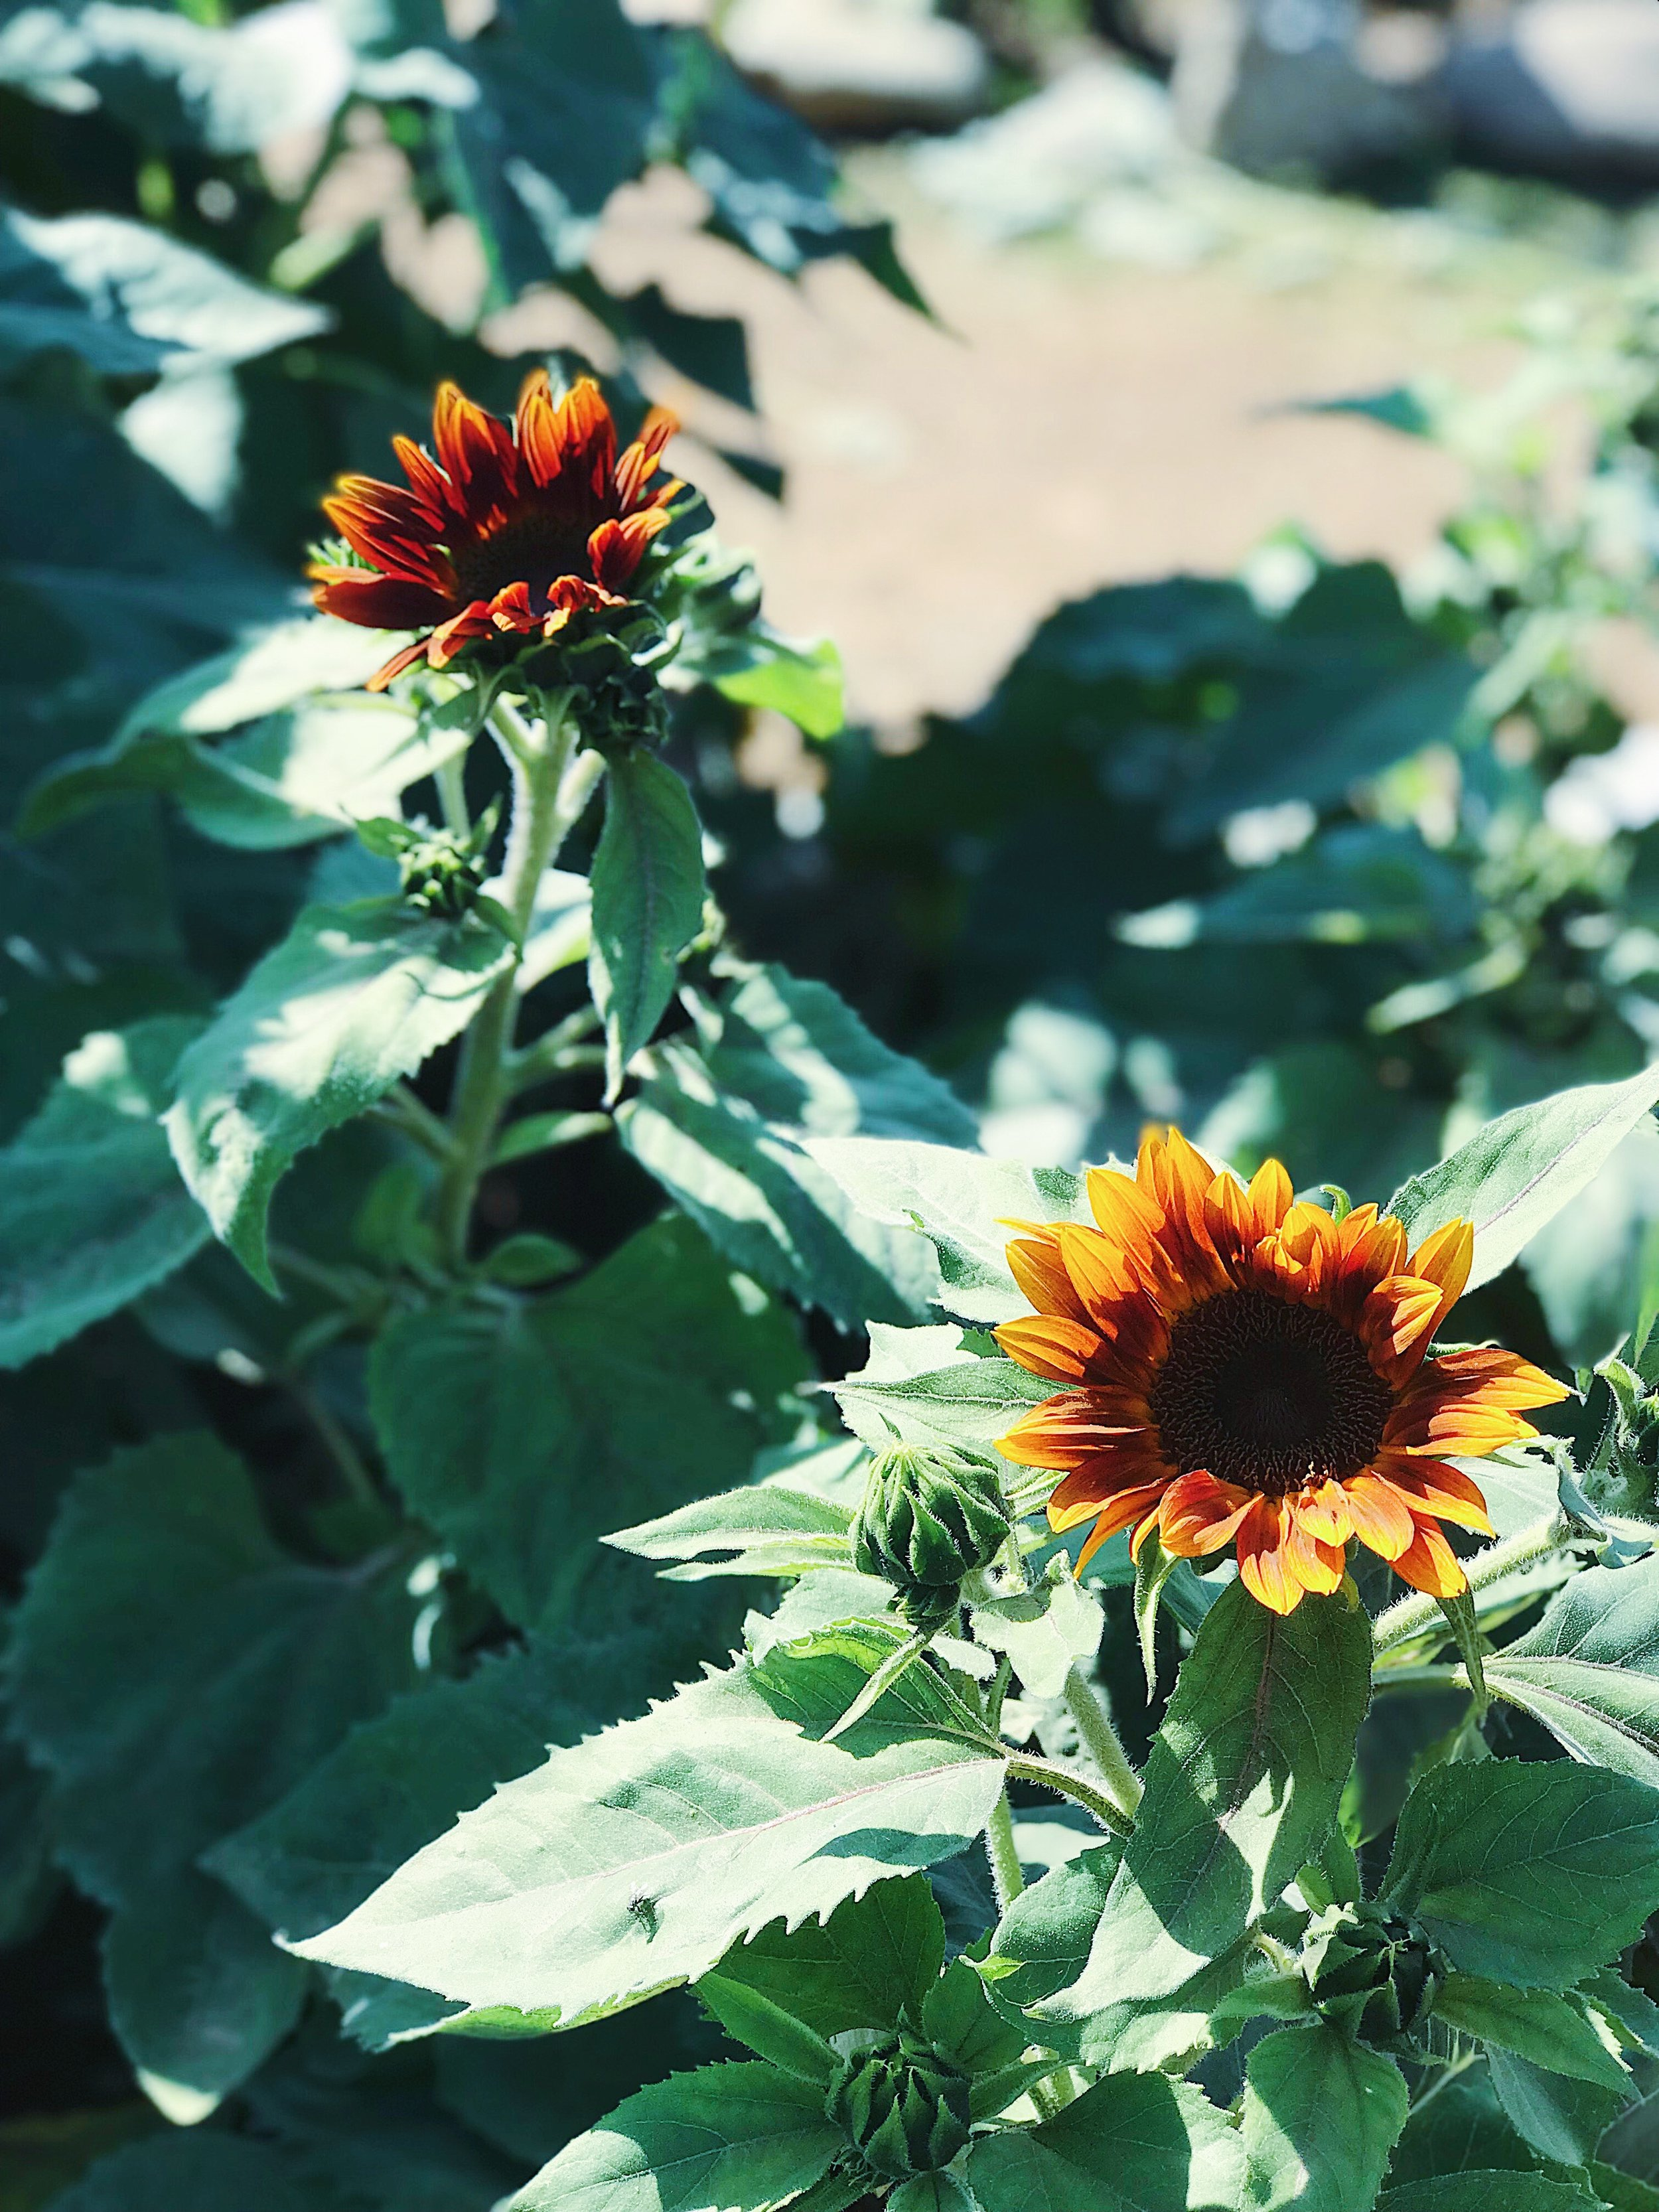 colored sunflowers.jpg